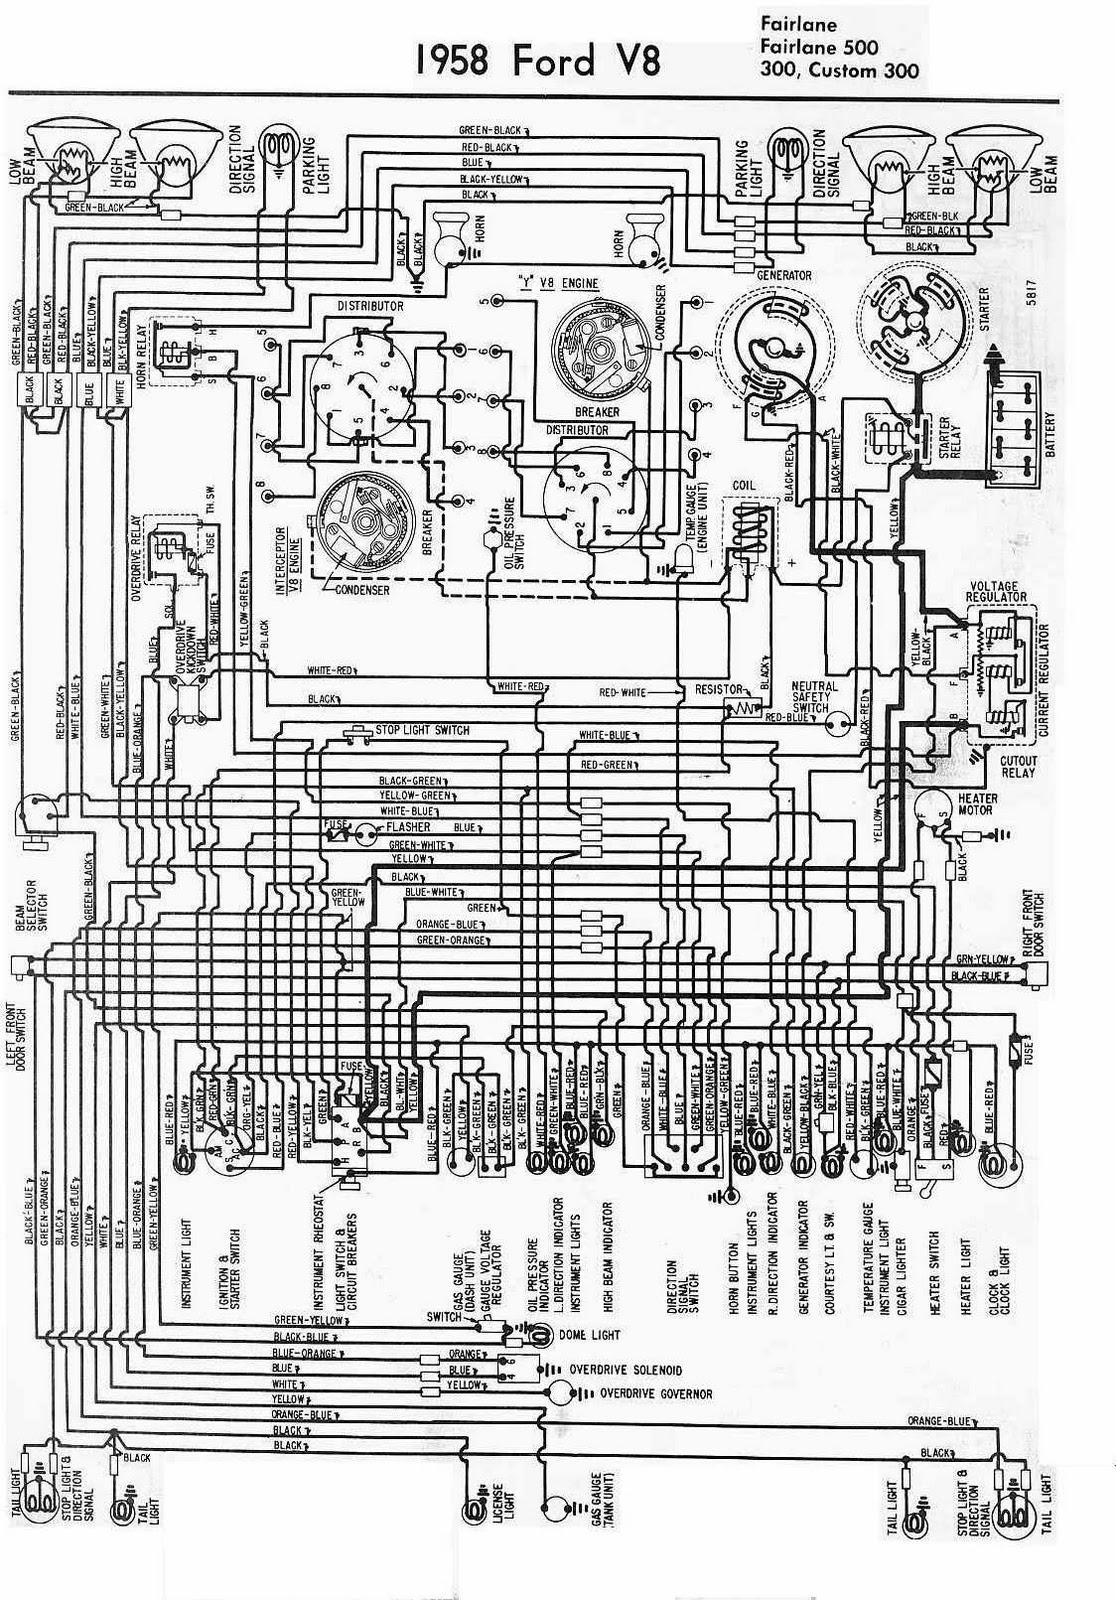 perkins sel engine turbo diagram perkins injector pump